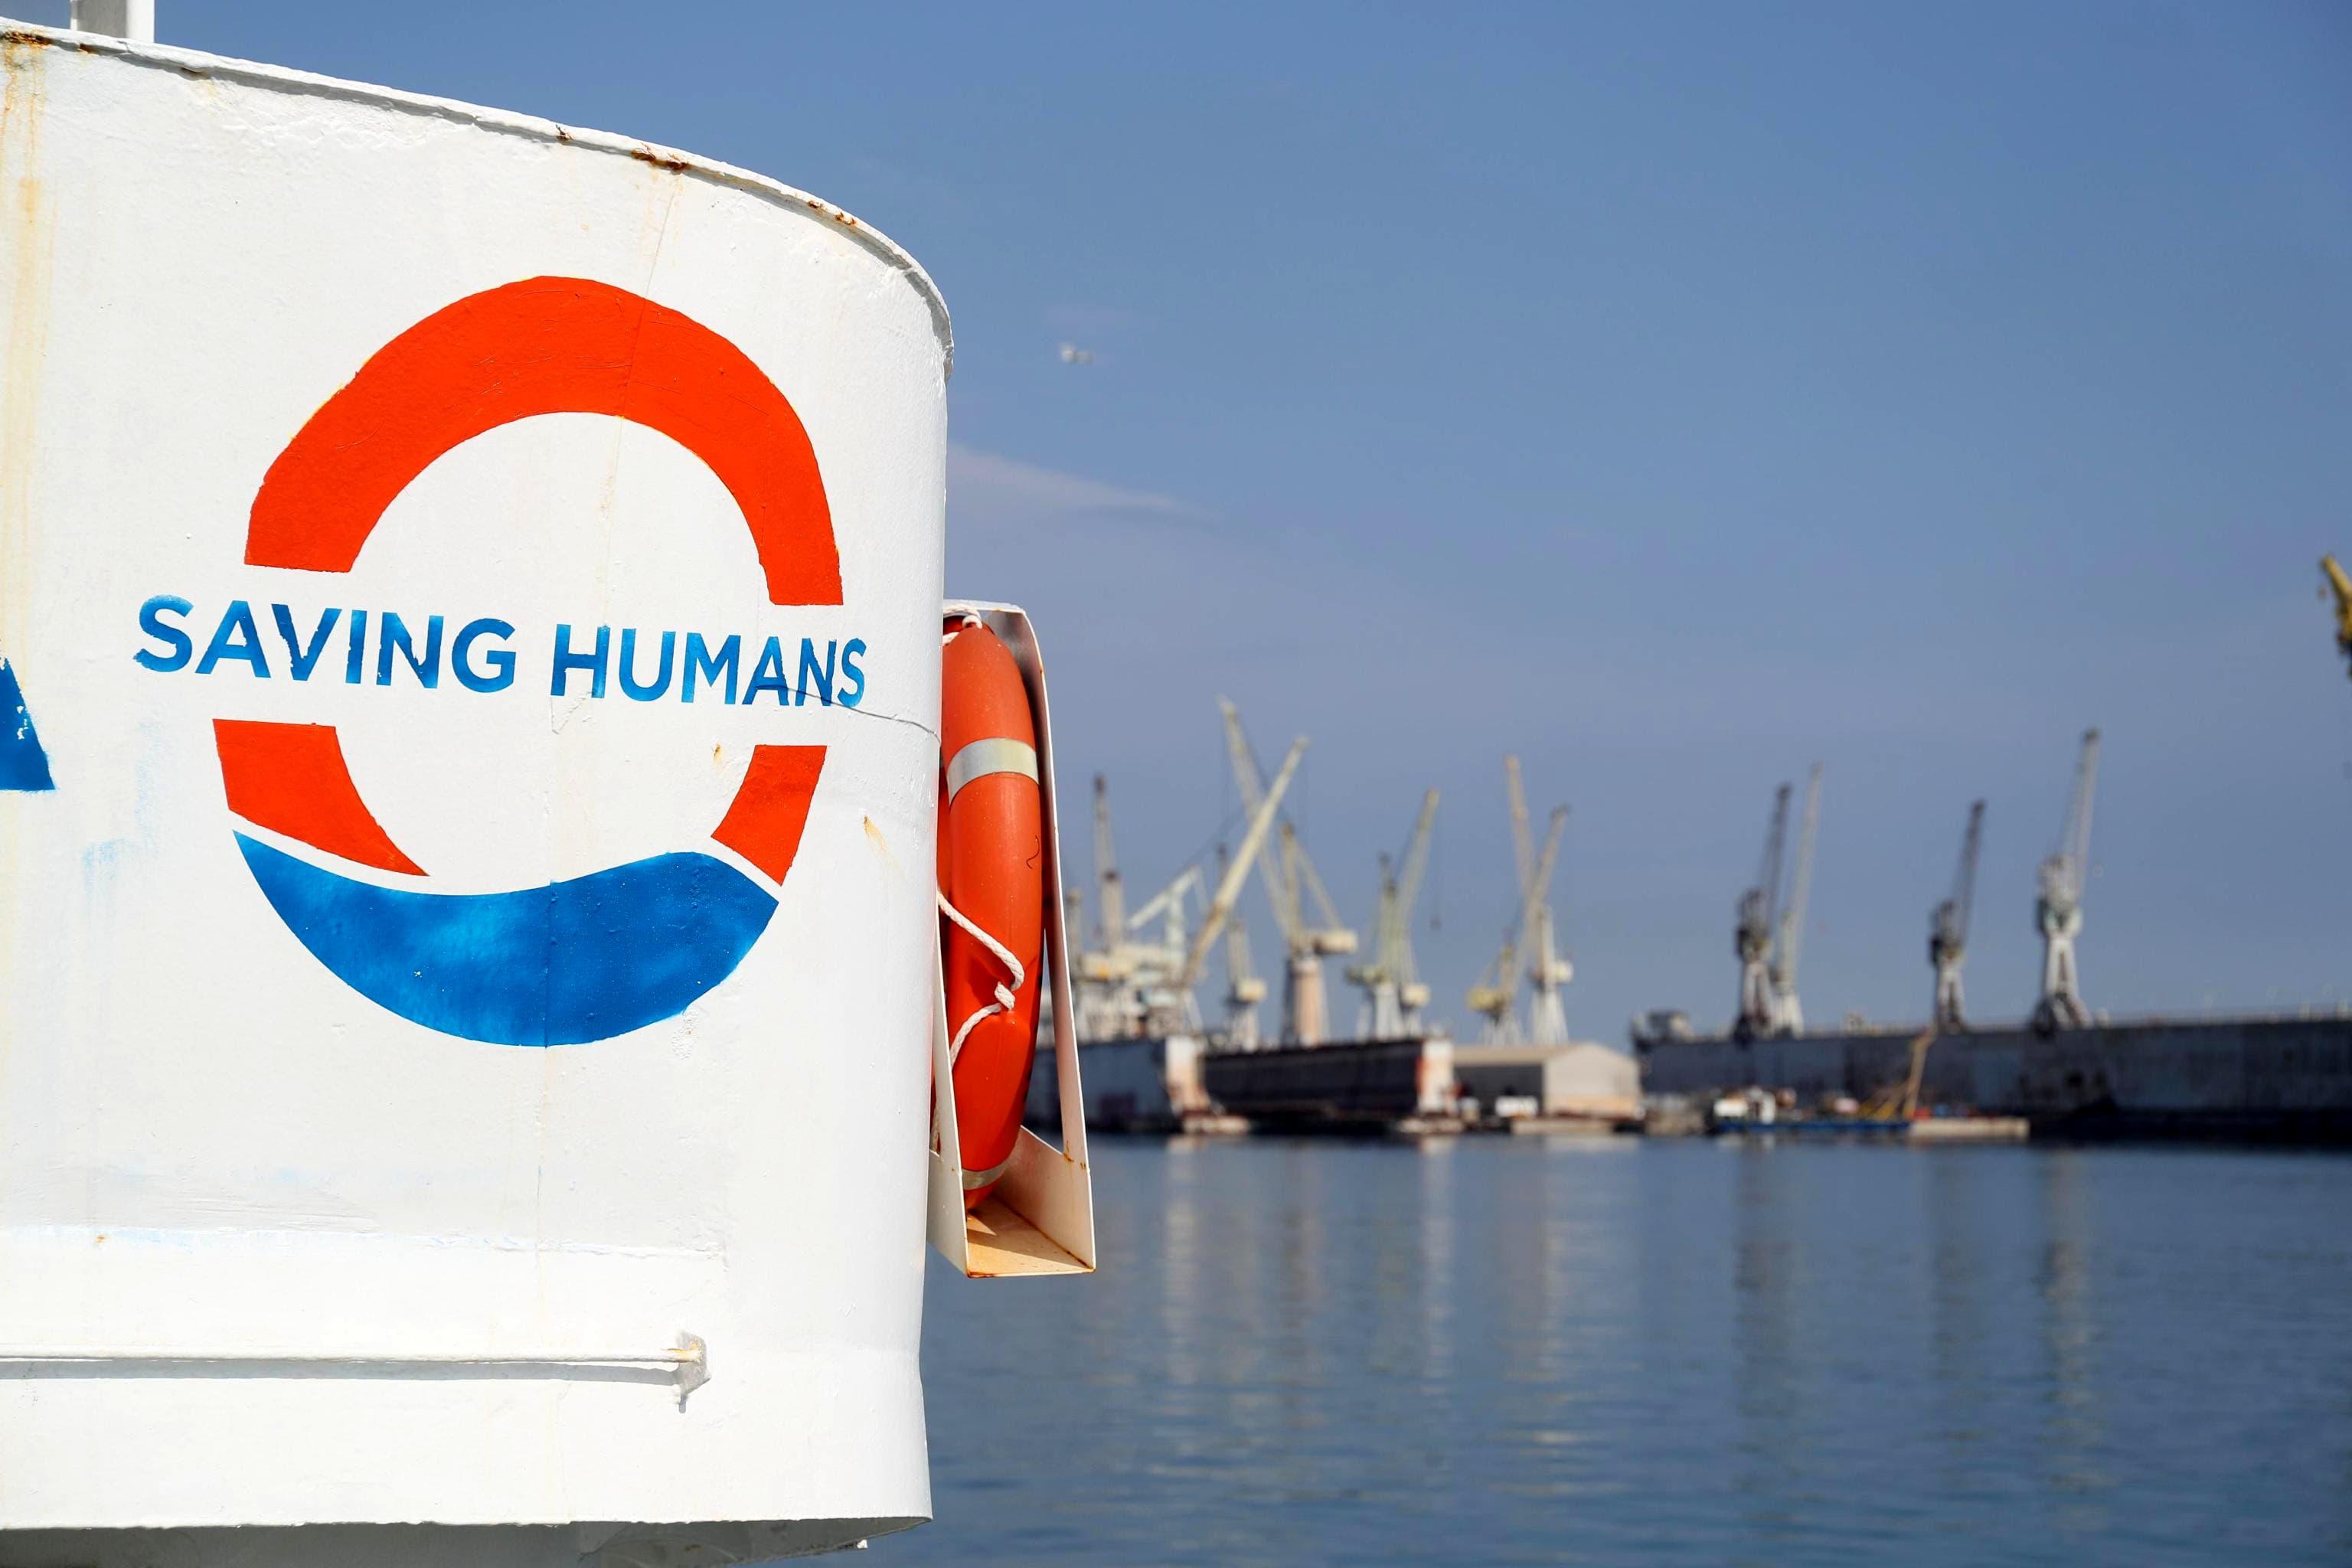 mediterranea ansa nave jonio migranti mediterraneo-2